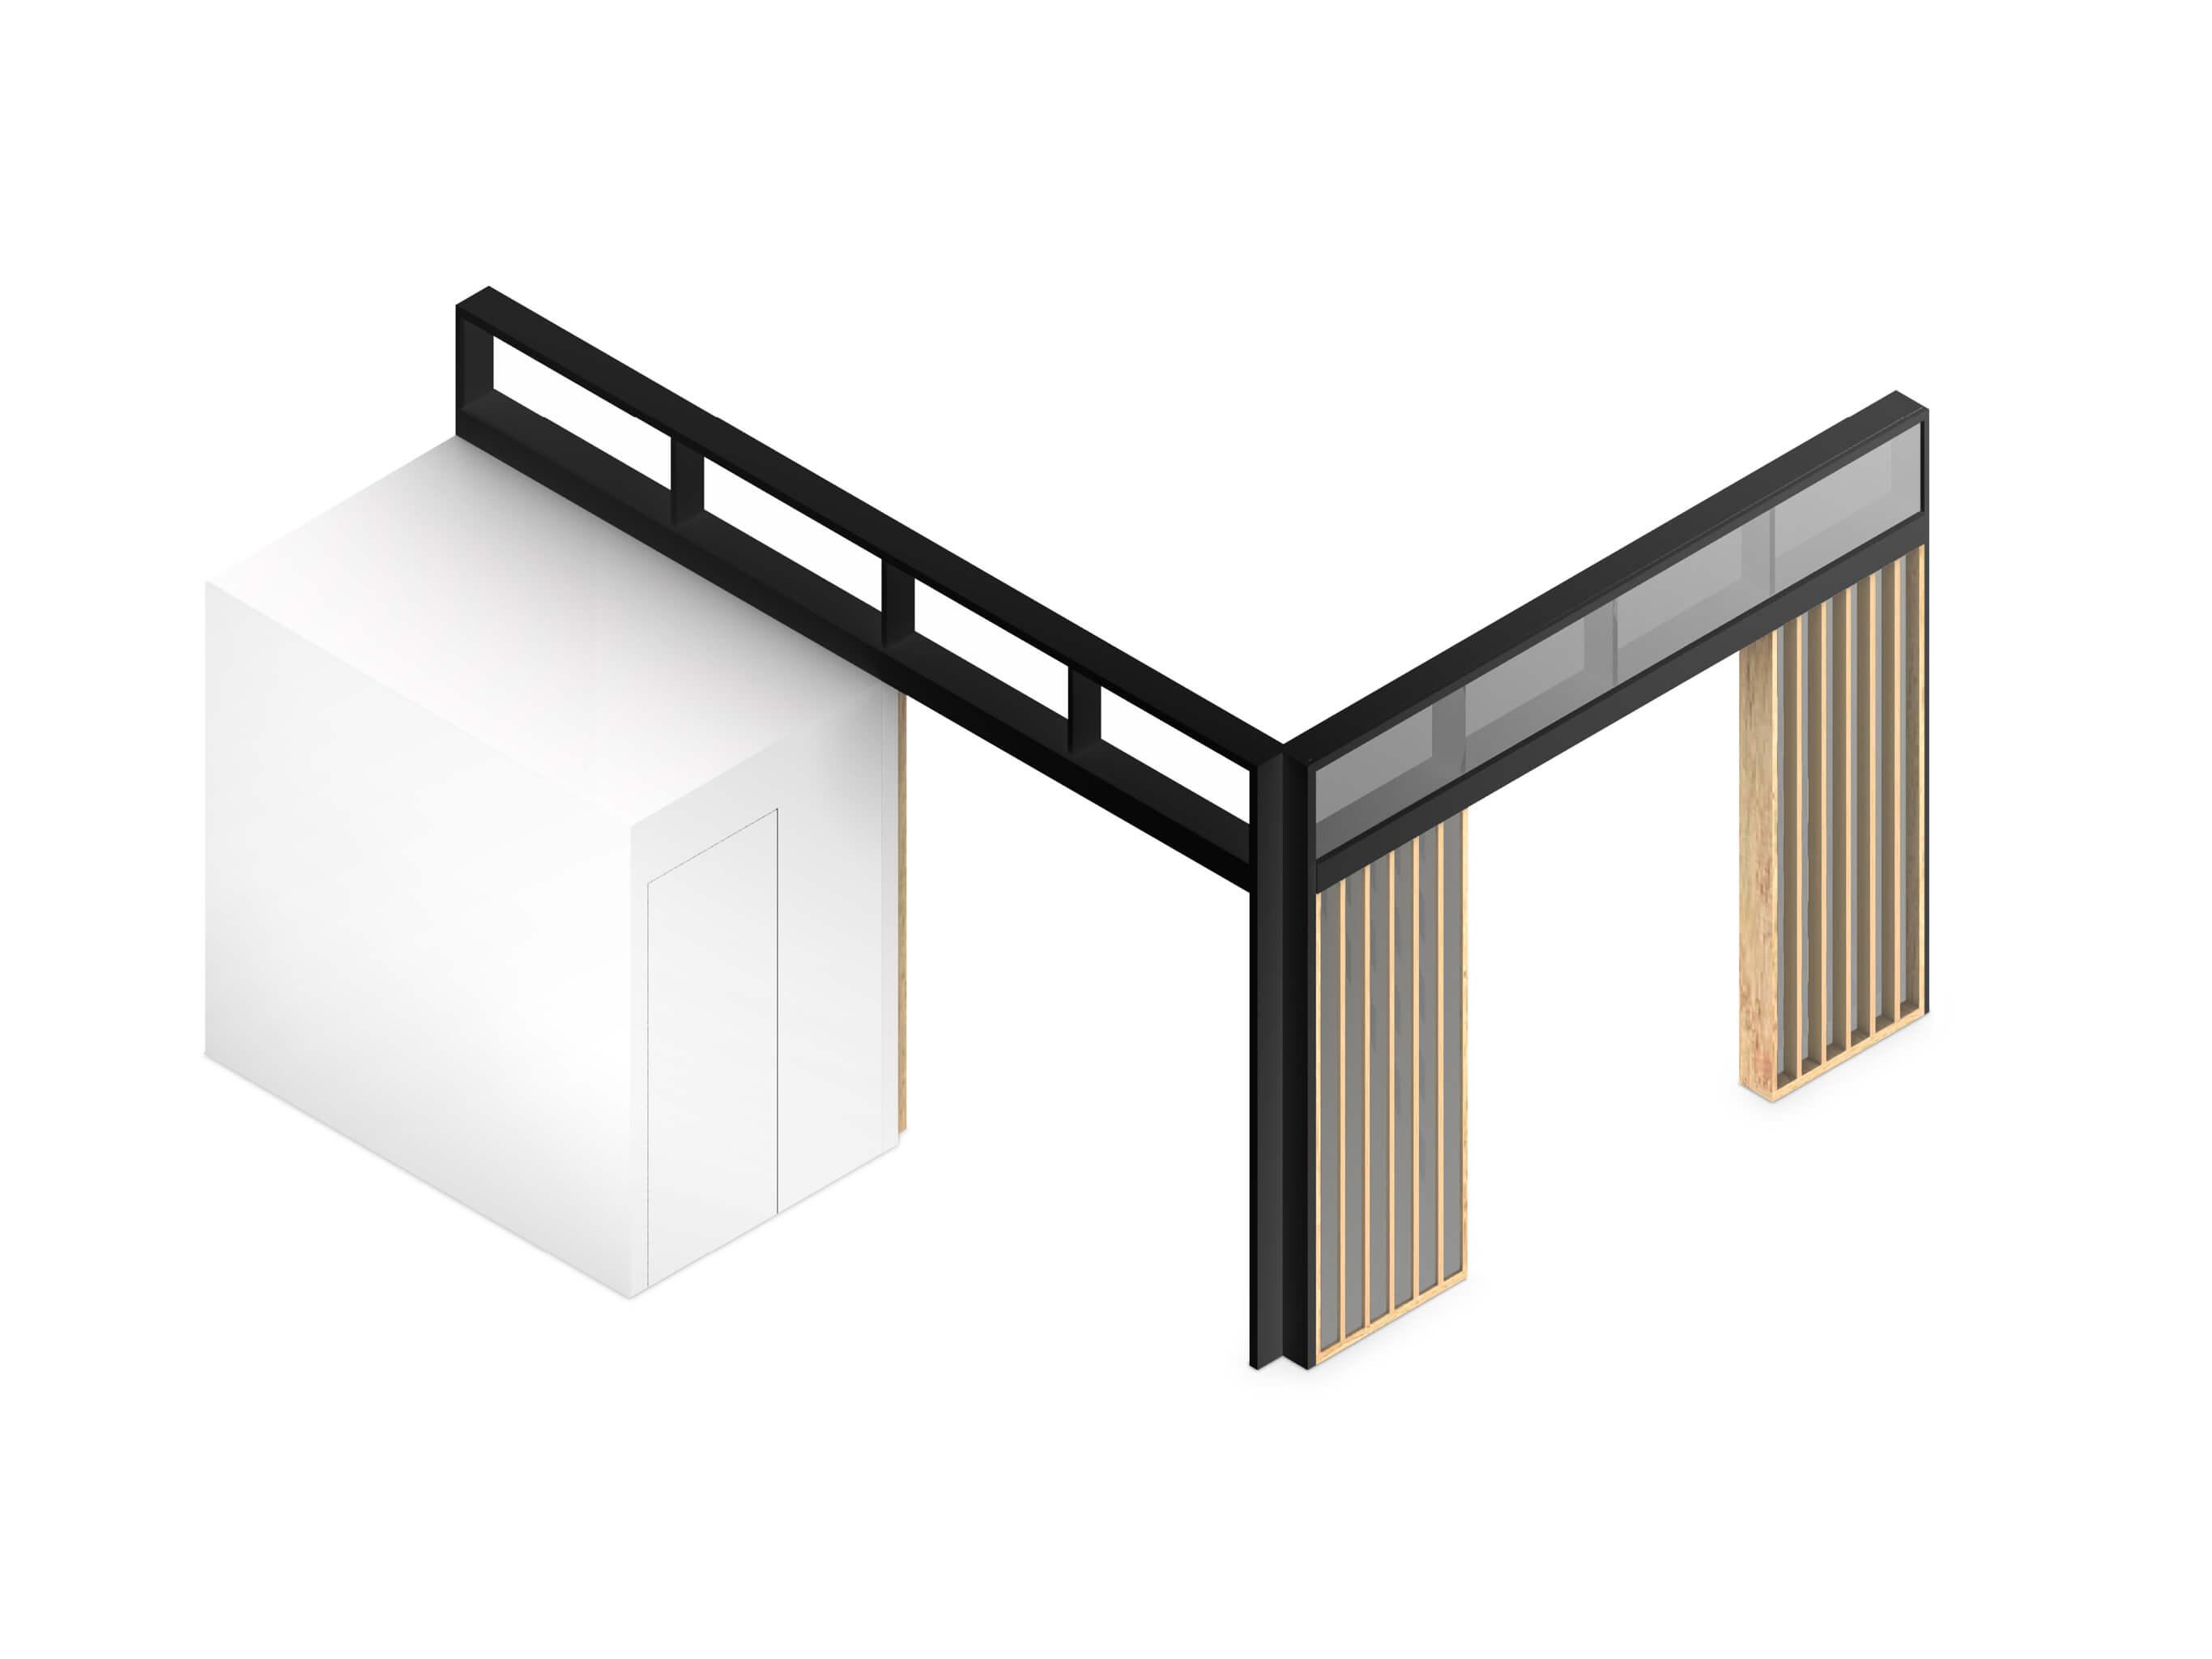 la-cremerie-mobilier-cloison-design-ichetkar